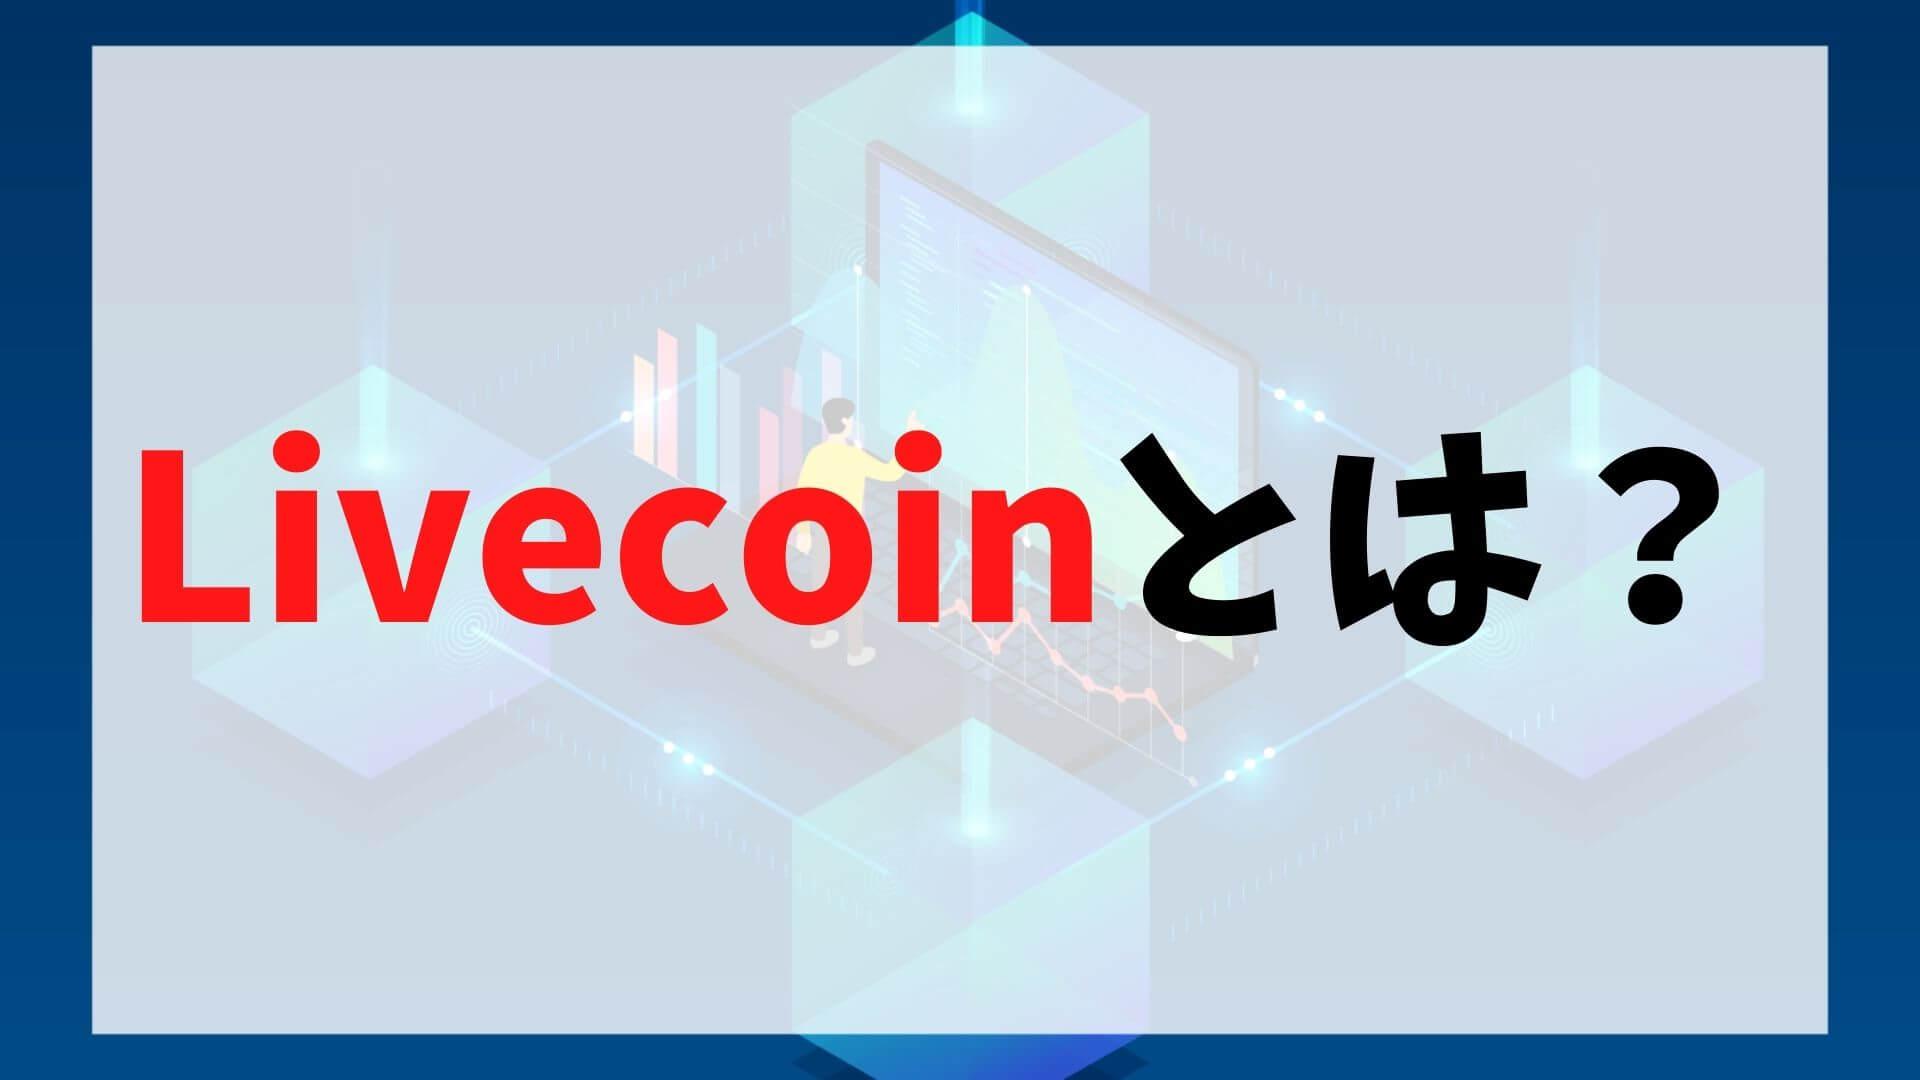 Livecoinとは